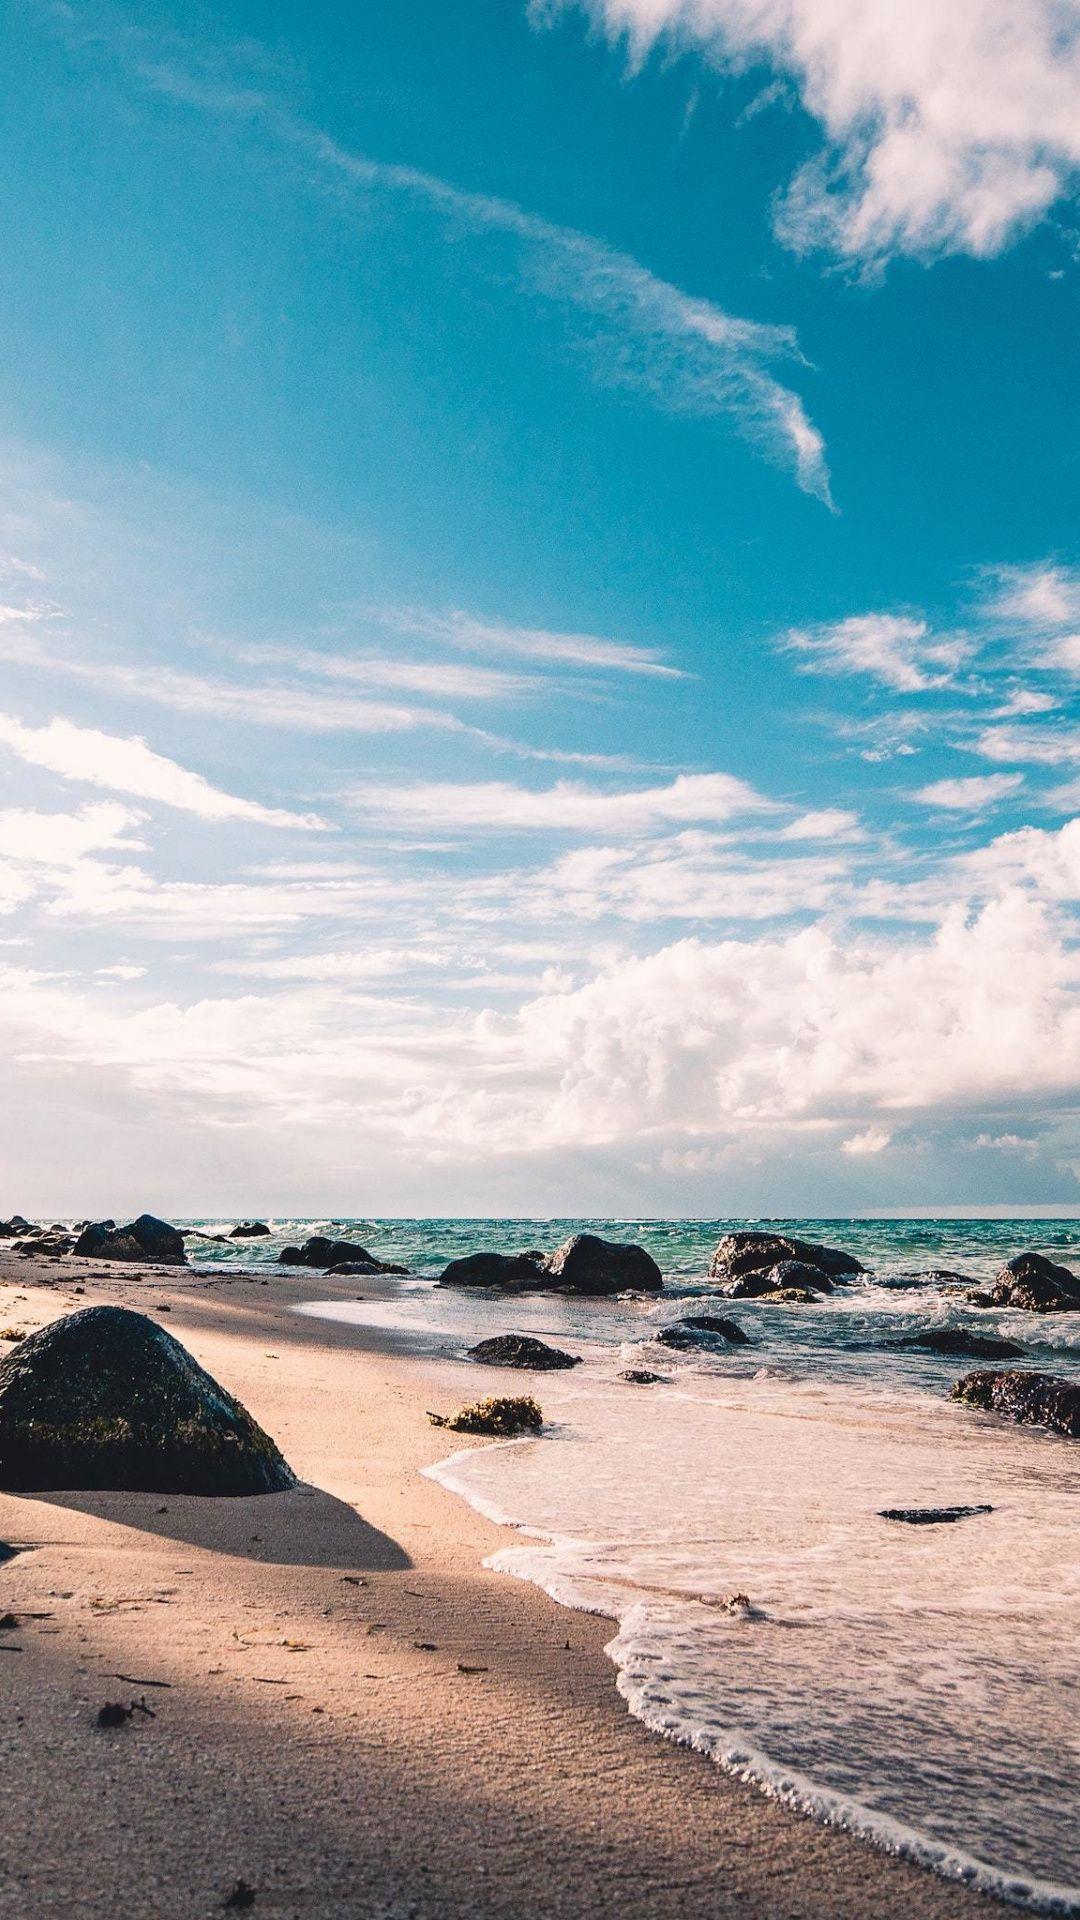 Beach Rocks Sunny Day Nature 1080x1920 Wallpaper In 2019